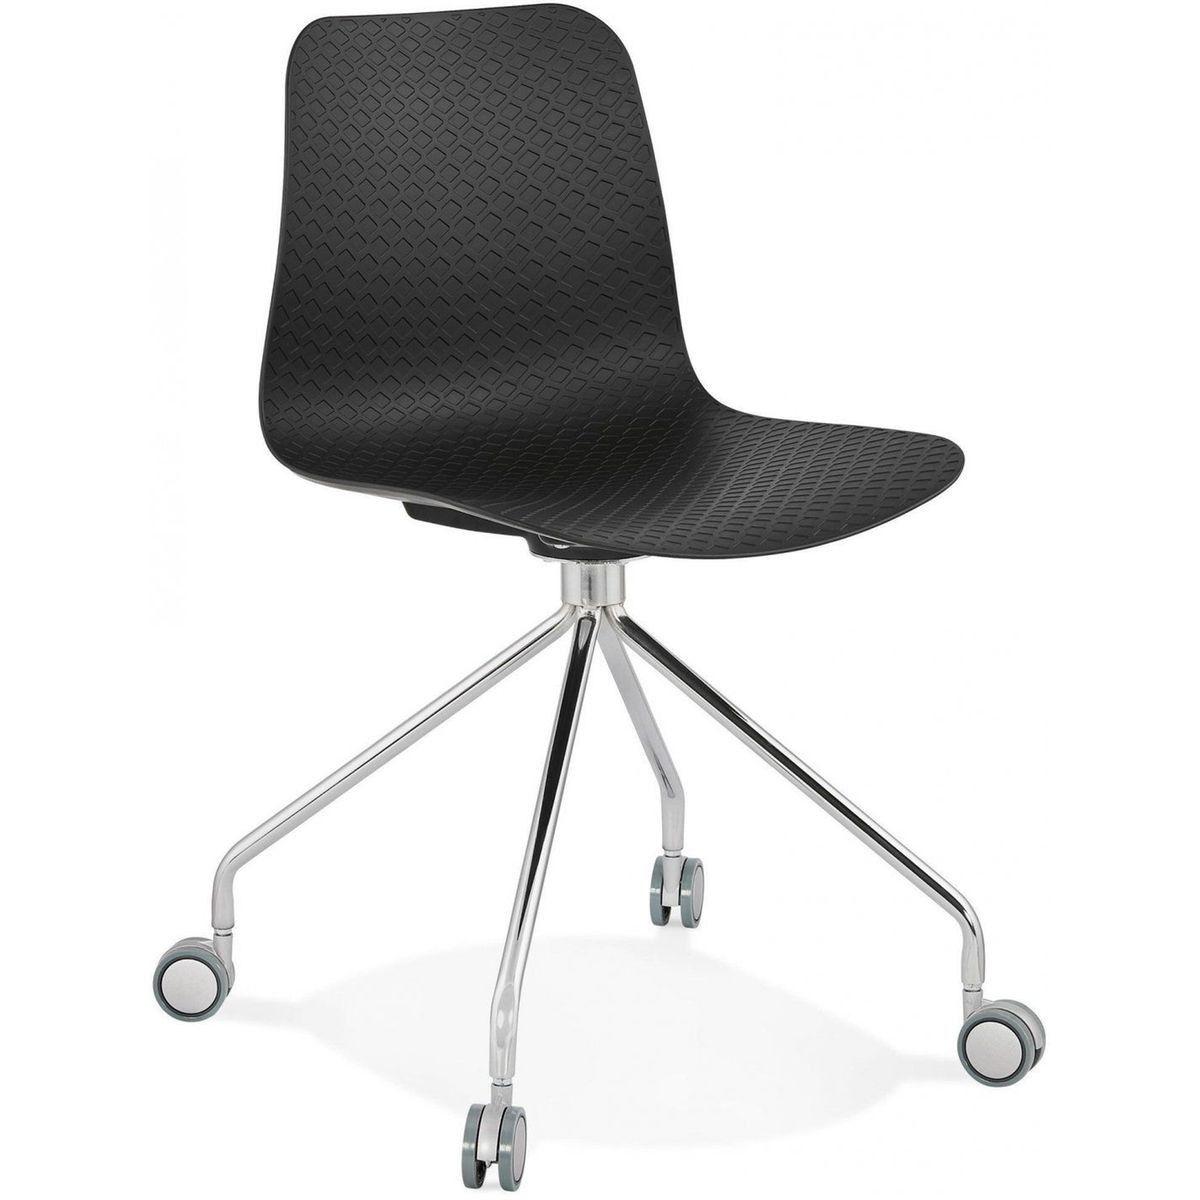 Chaise Design Polymere Rulle Taille Tu Products Conception De Chaise Chaise Bureau Et Chaise